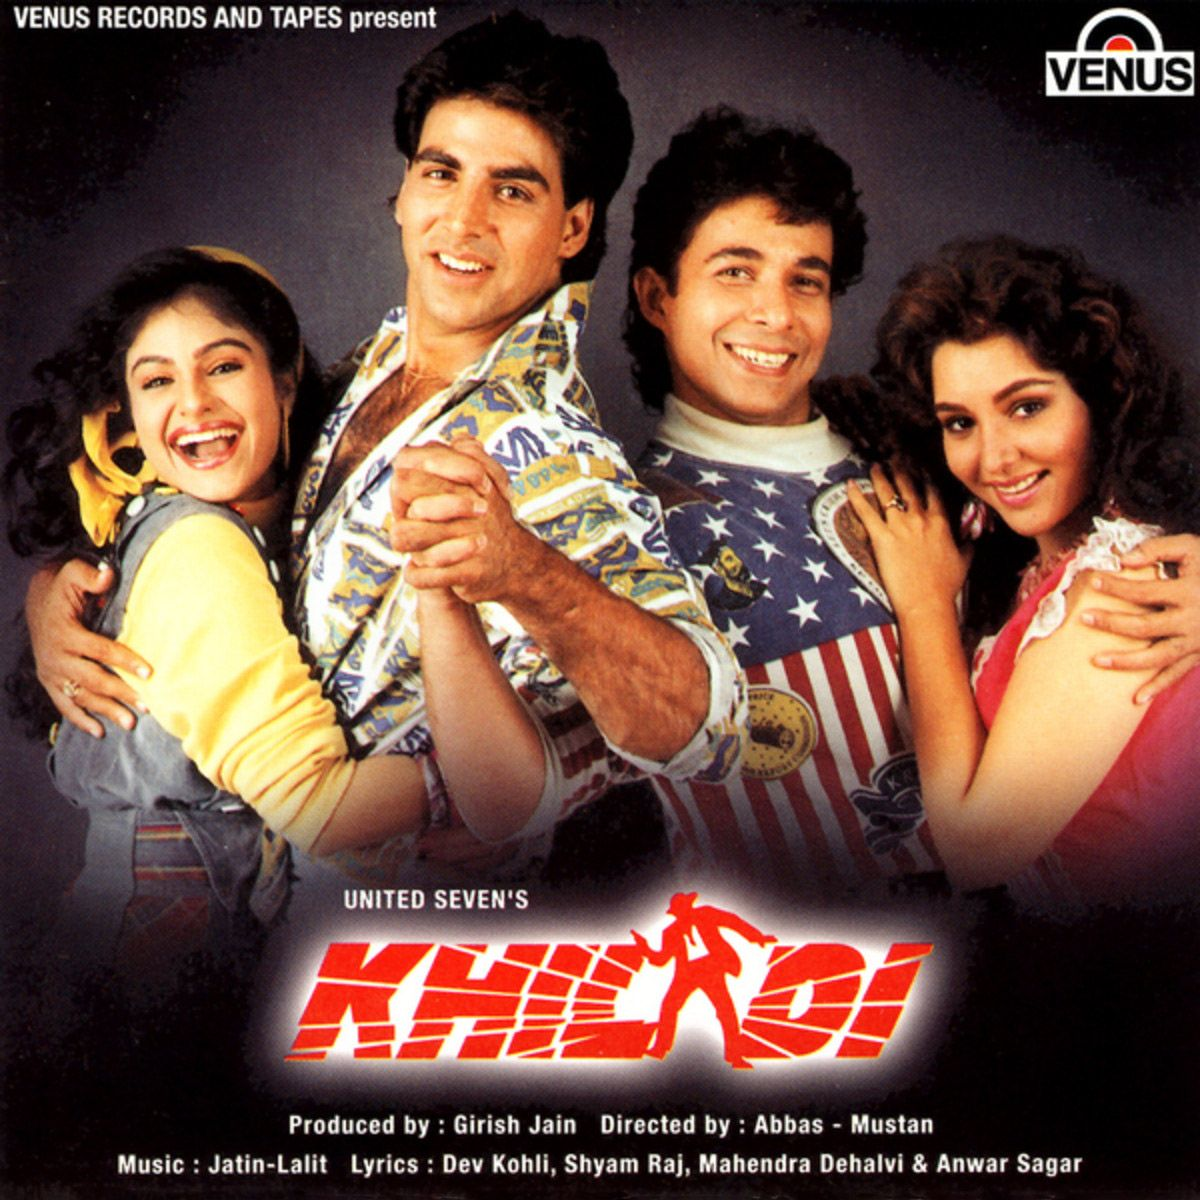 Ak Tha Khiladi Moovi Hindi: Top 100 Hindi Movies